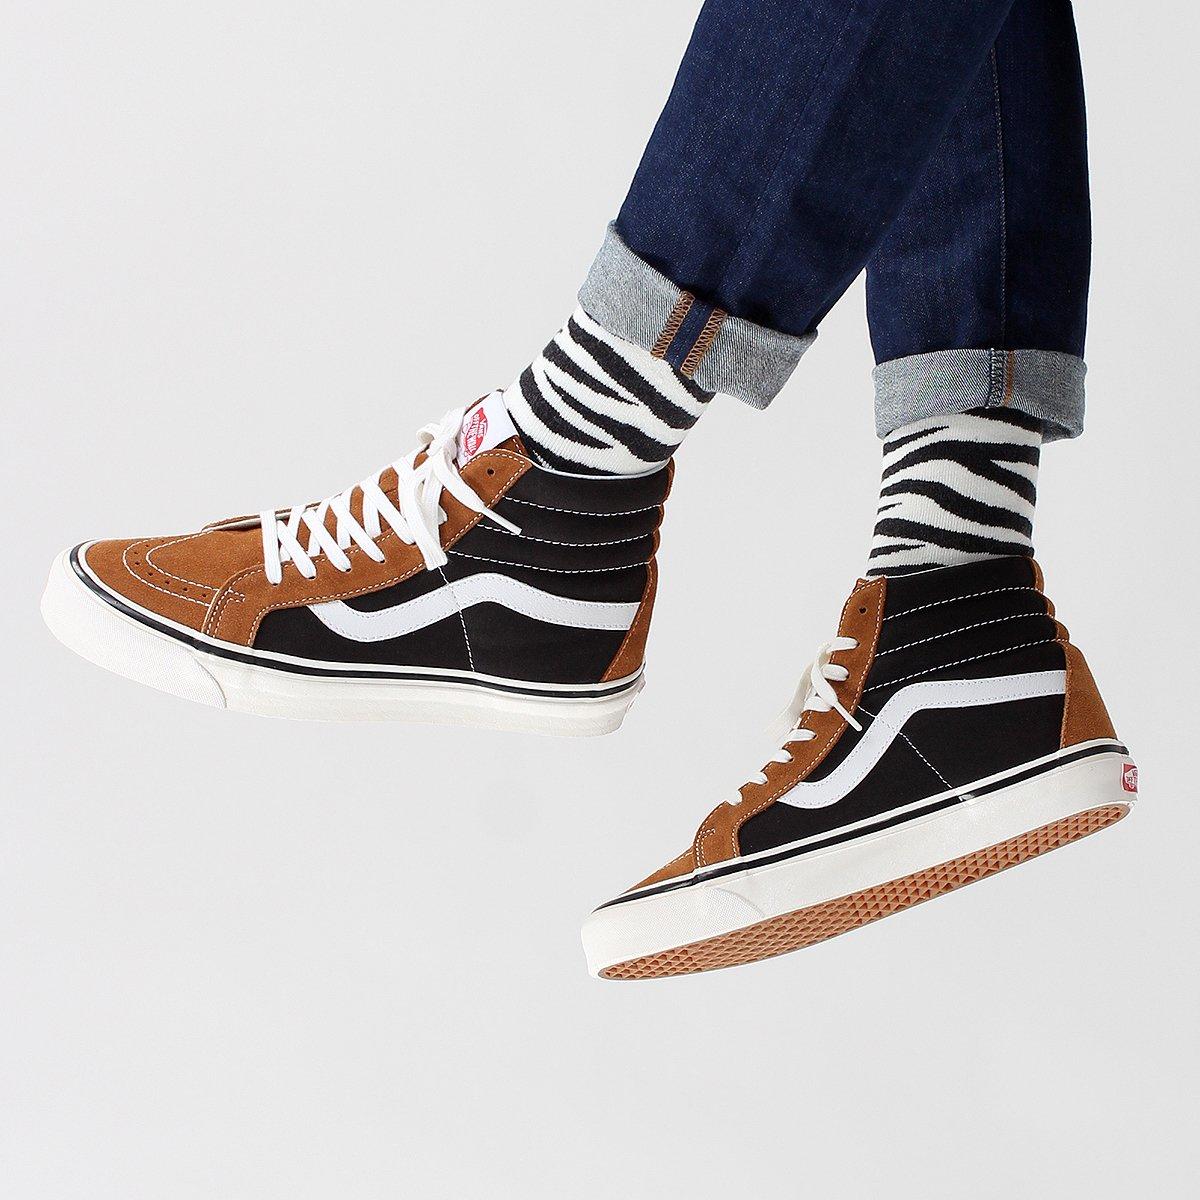 a130e9aaa456b0 Vans SK8-Hi 38 DX Shoes – (Anaheim Factory) OG Hart Brown   OG Black...  https   goo.gl oubYJY Jeans    edwineurope ED-85 Slim Tapered Power Blue  11.5oz ...